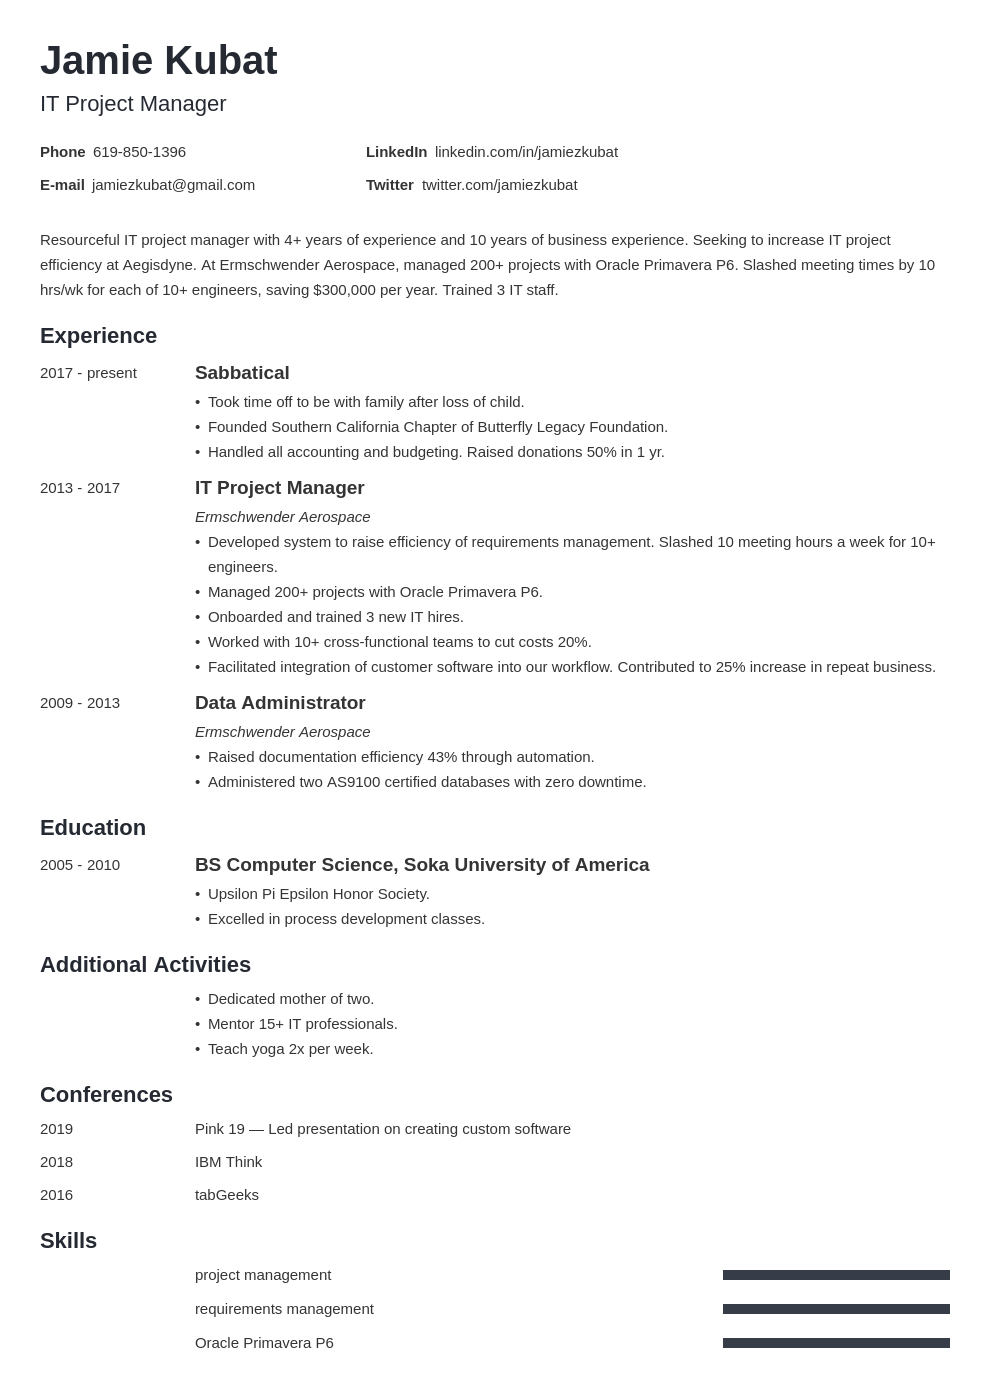 resume employment gaps template minimo uk